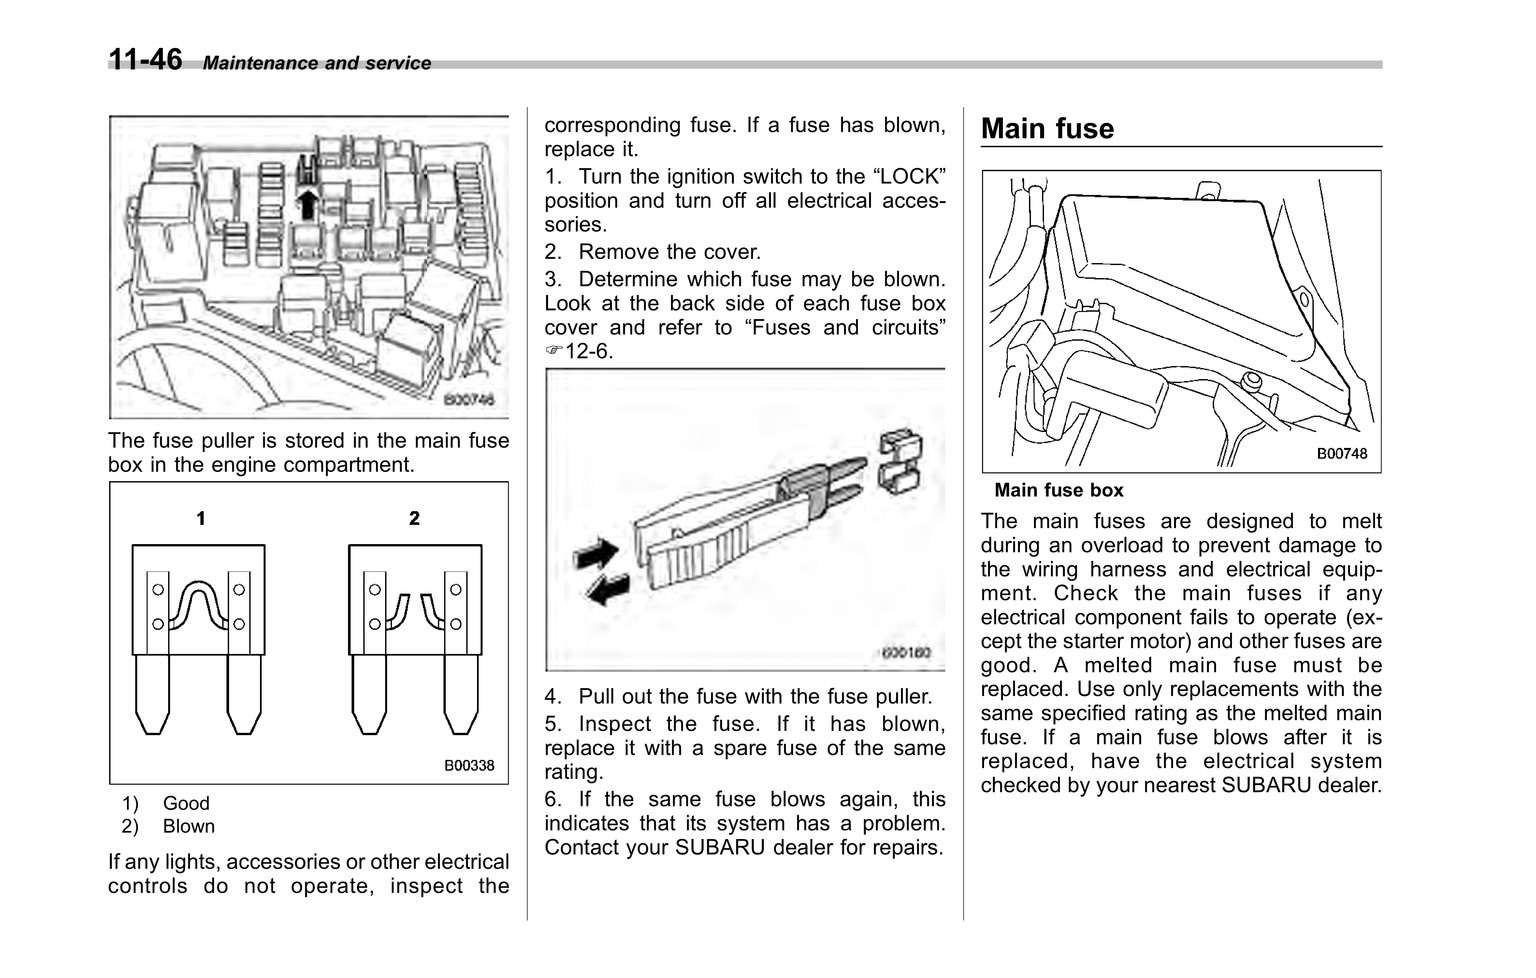 Mf 4459 Subaru Forester Engine Diagram On 1999 Subaru Forester Engine Diagram Wiring Diagram